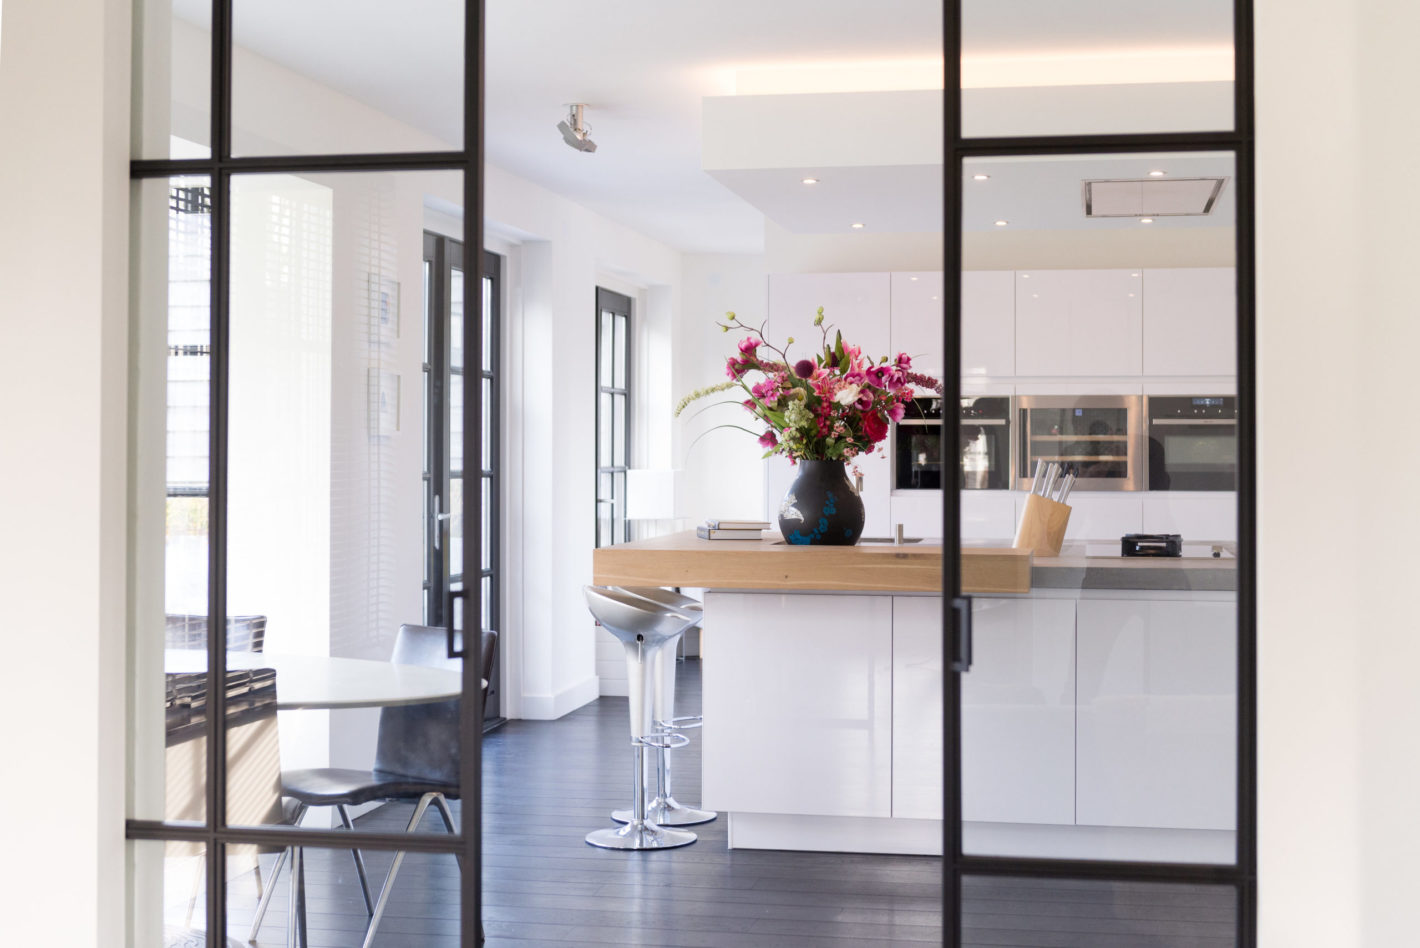 Keuken in Villapark met kookeiland